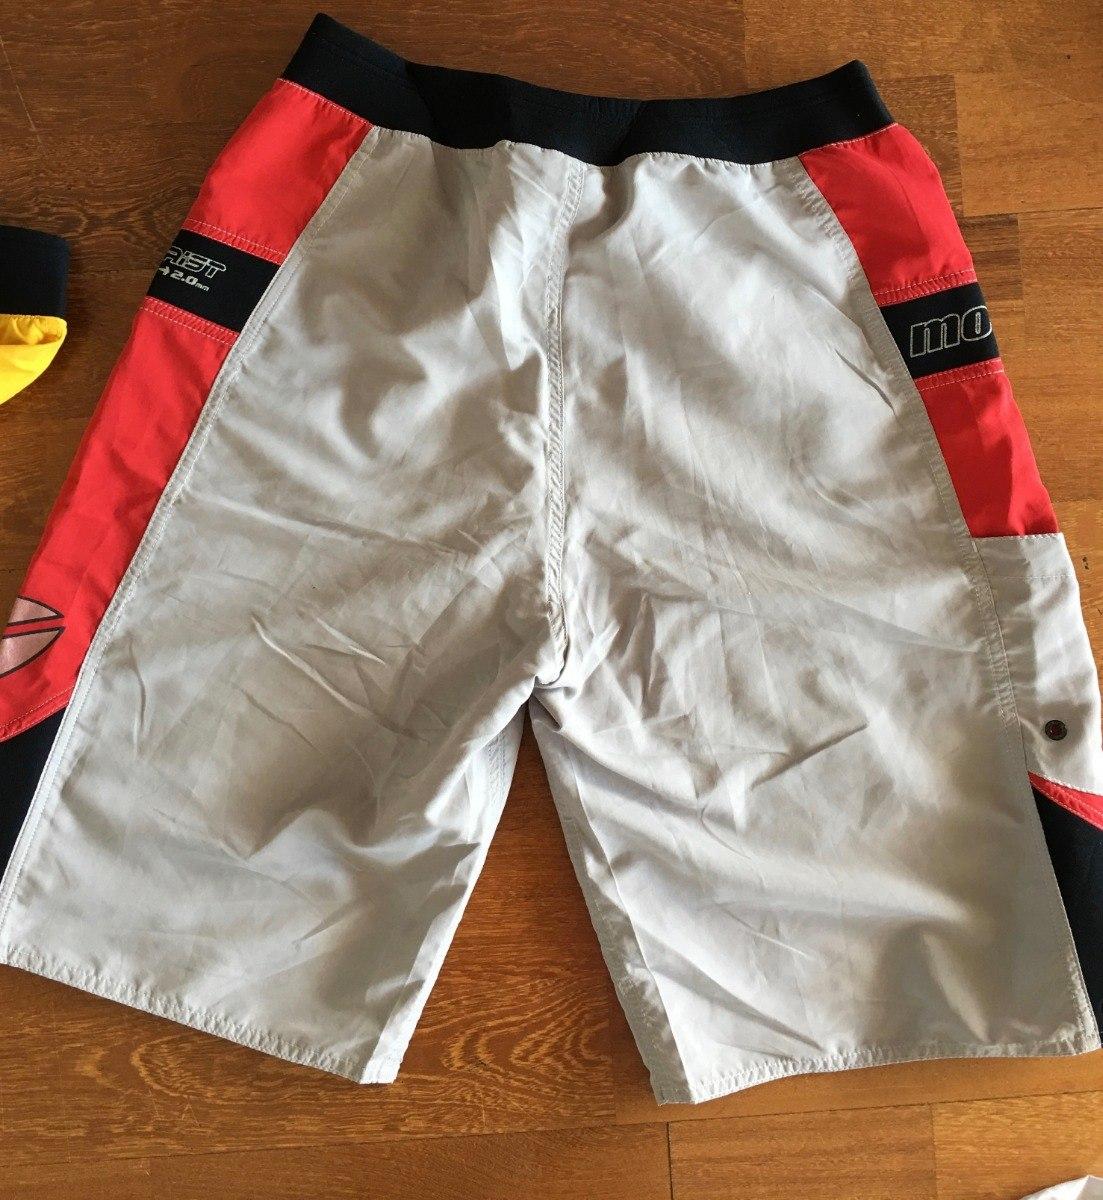 Combo X 2 Traje Baño Hombre Talle L Surfer Mormaii Rip Curl -   850 ... 6961eb2671